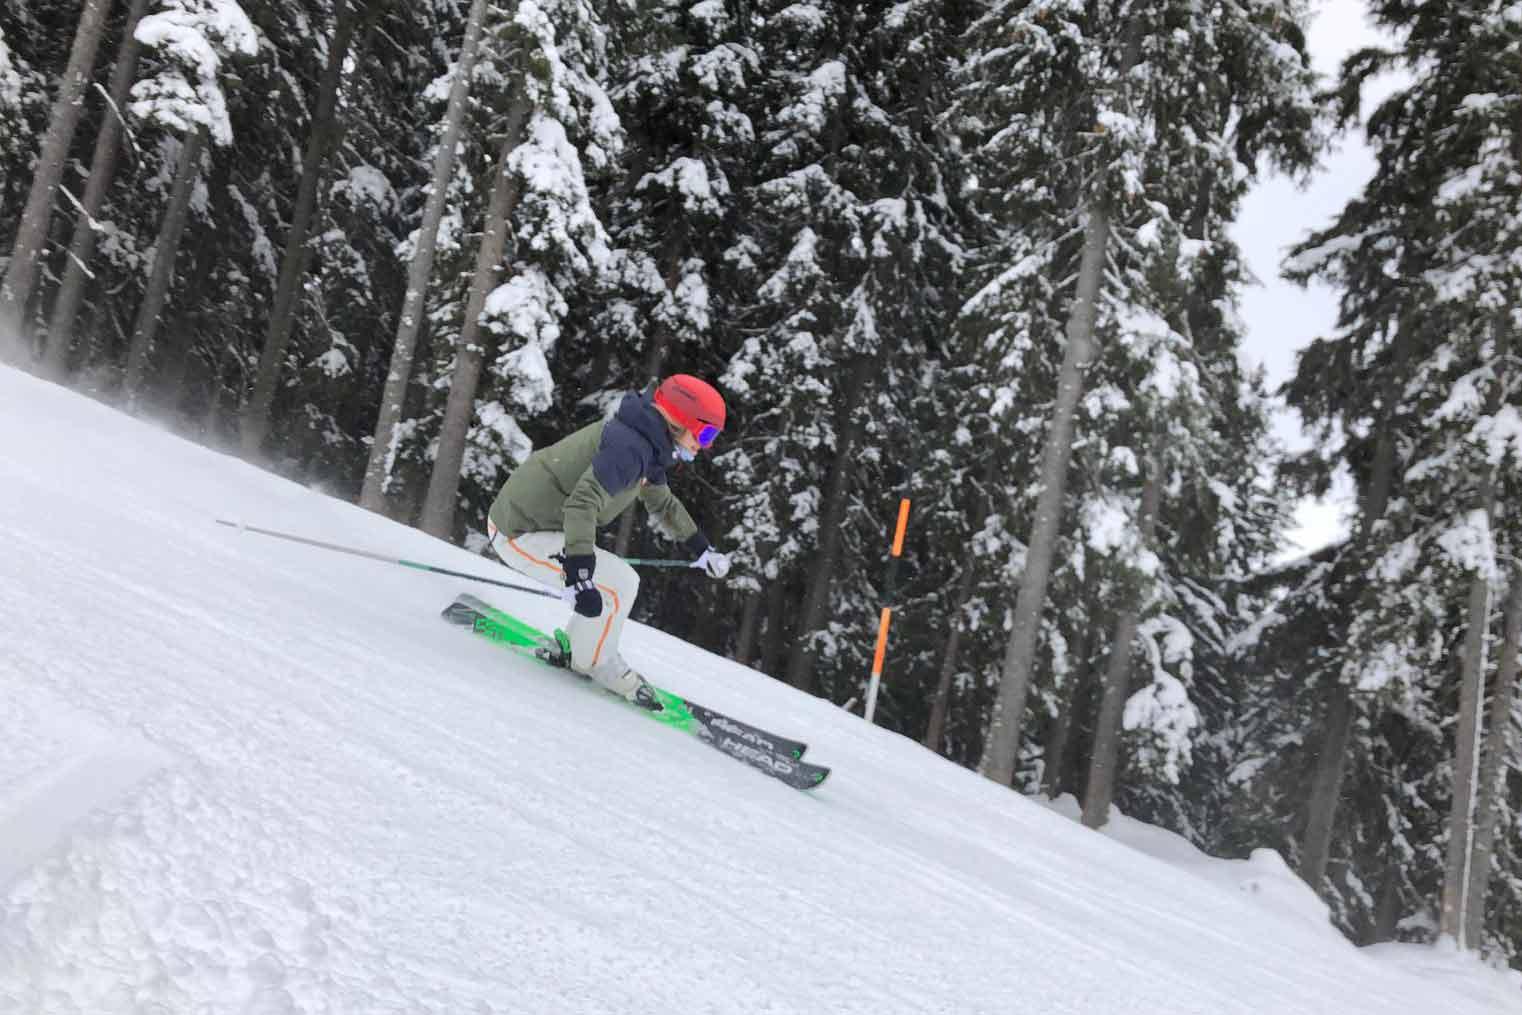 Skiën op de piste op een allmountain ski